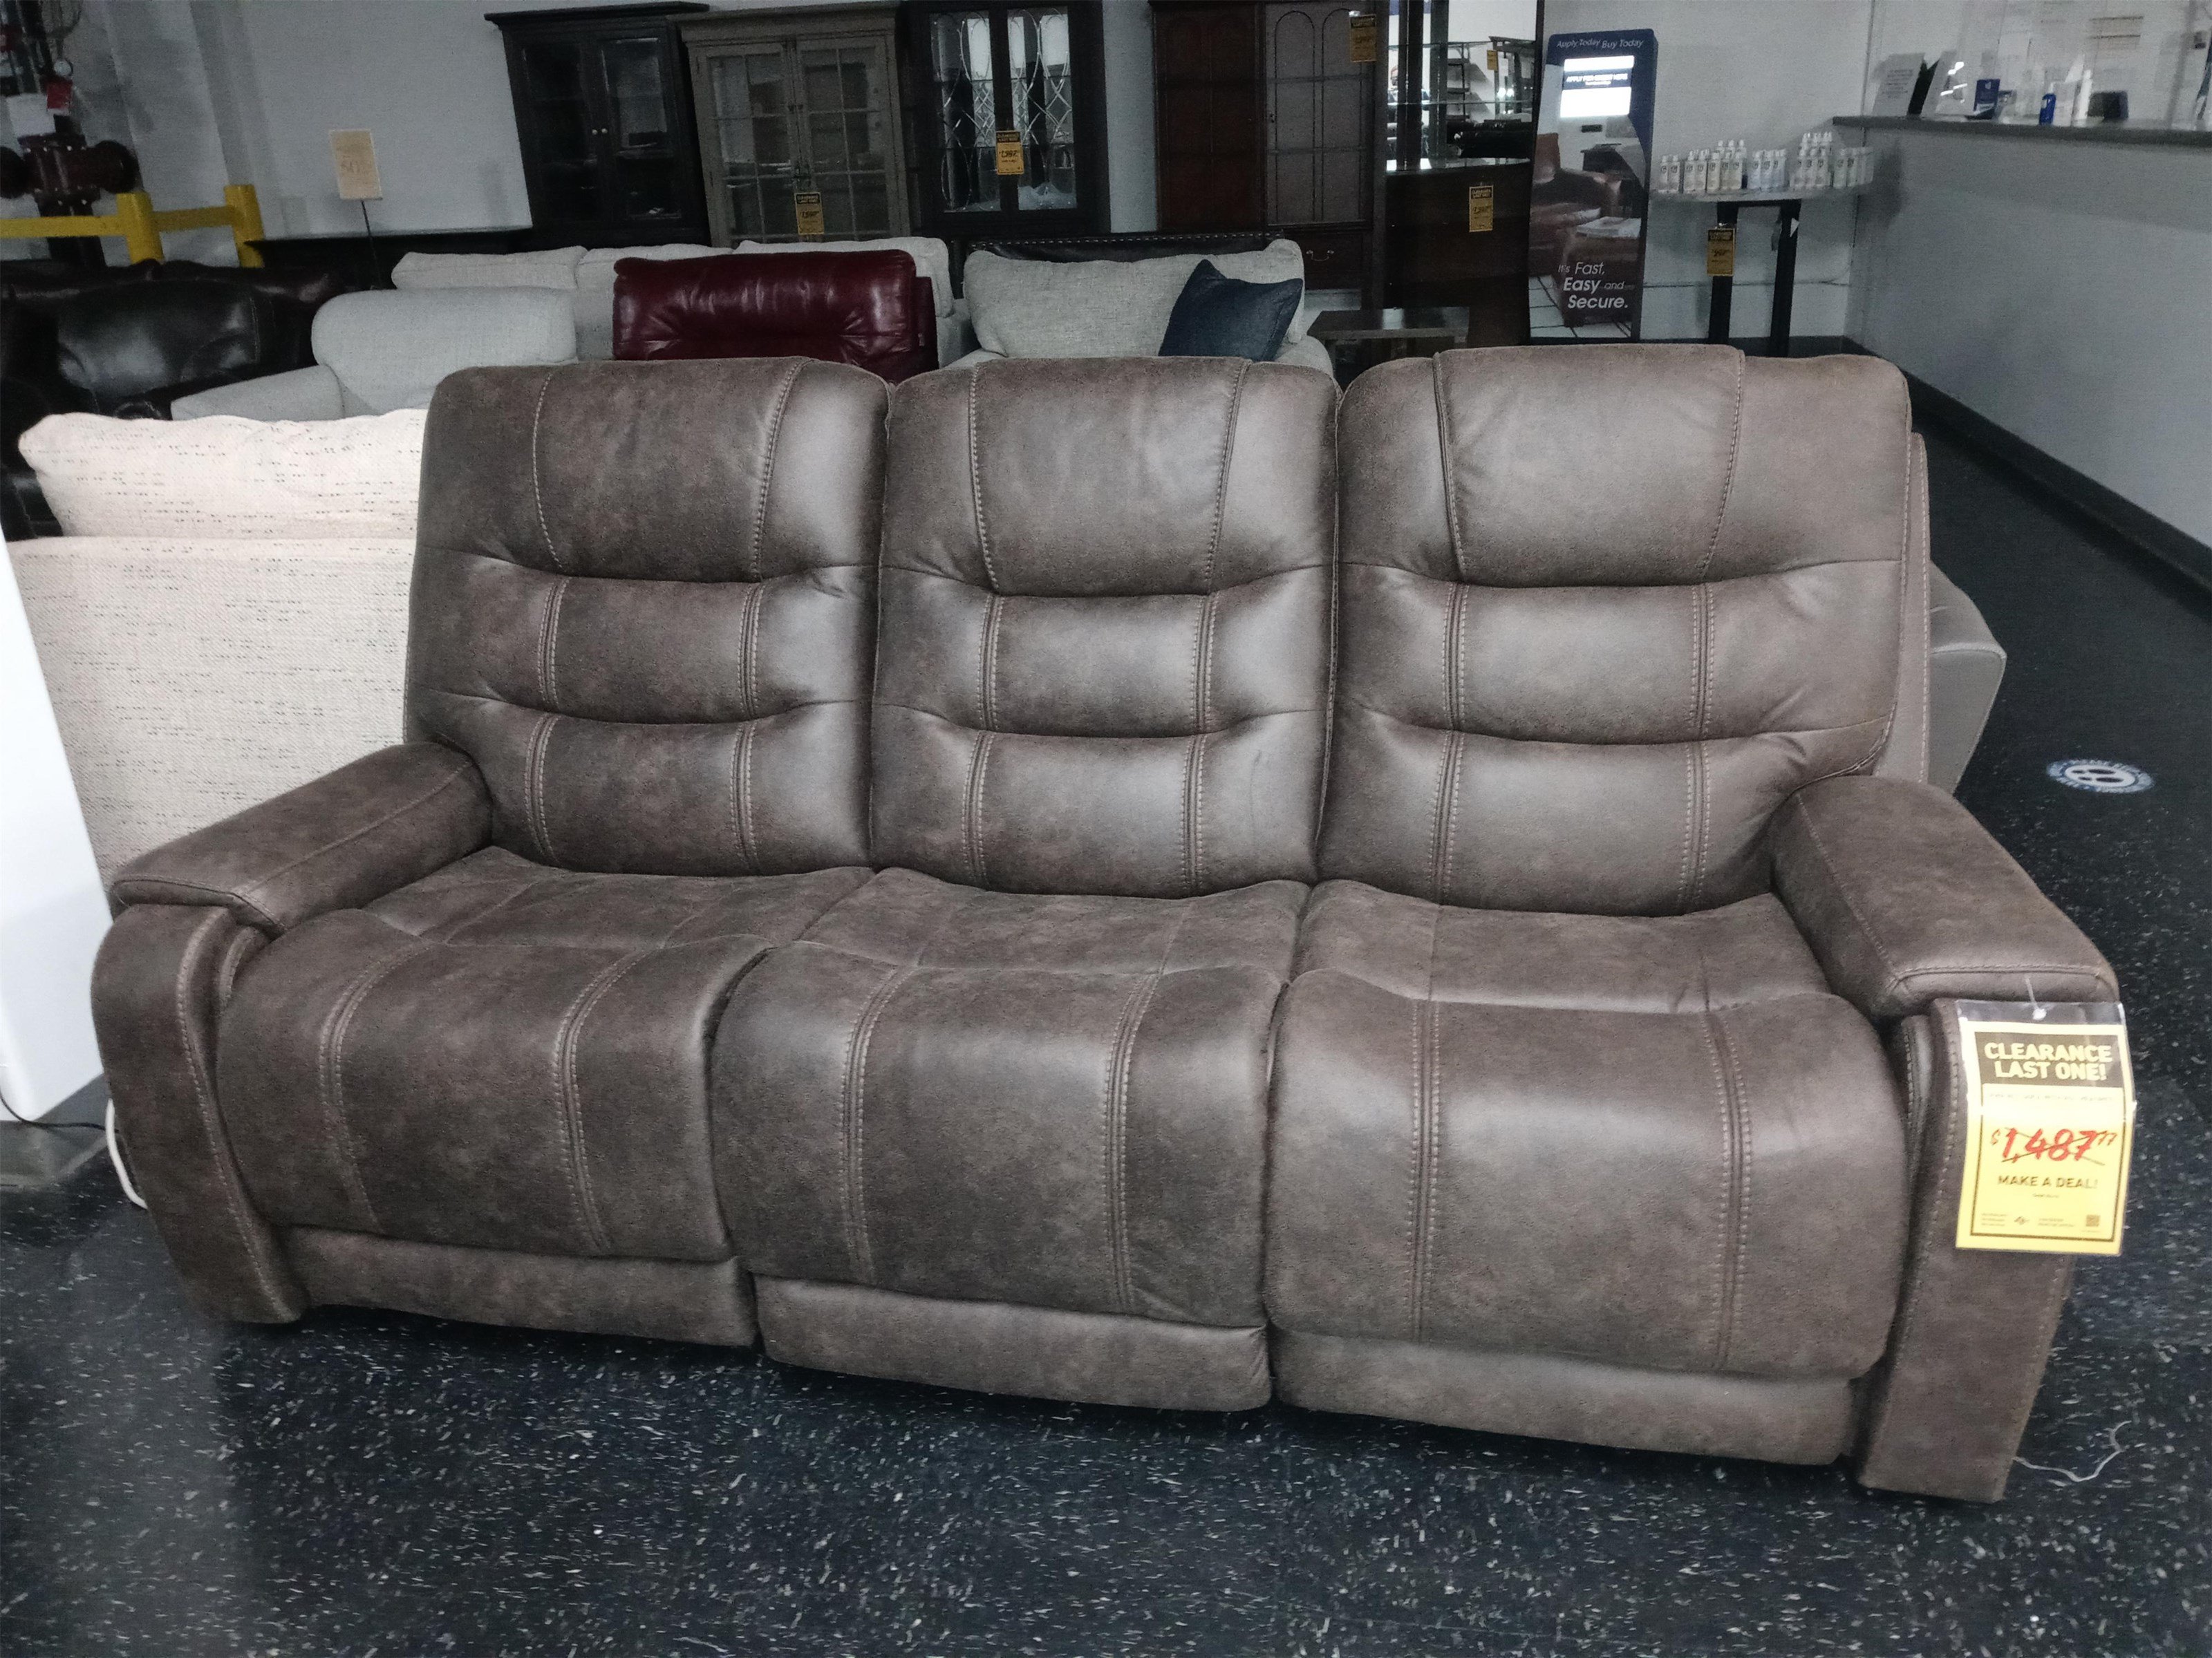 Last One Sofa Last One! Sofa! at Morris Home